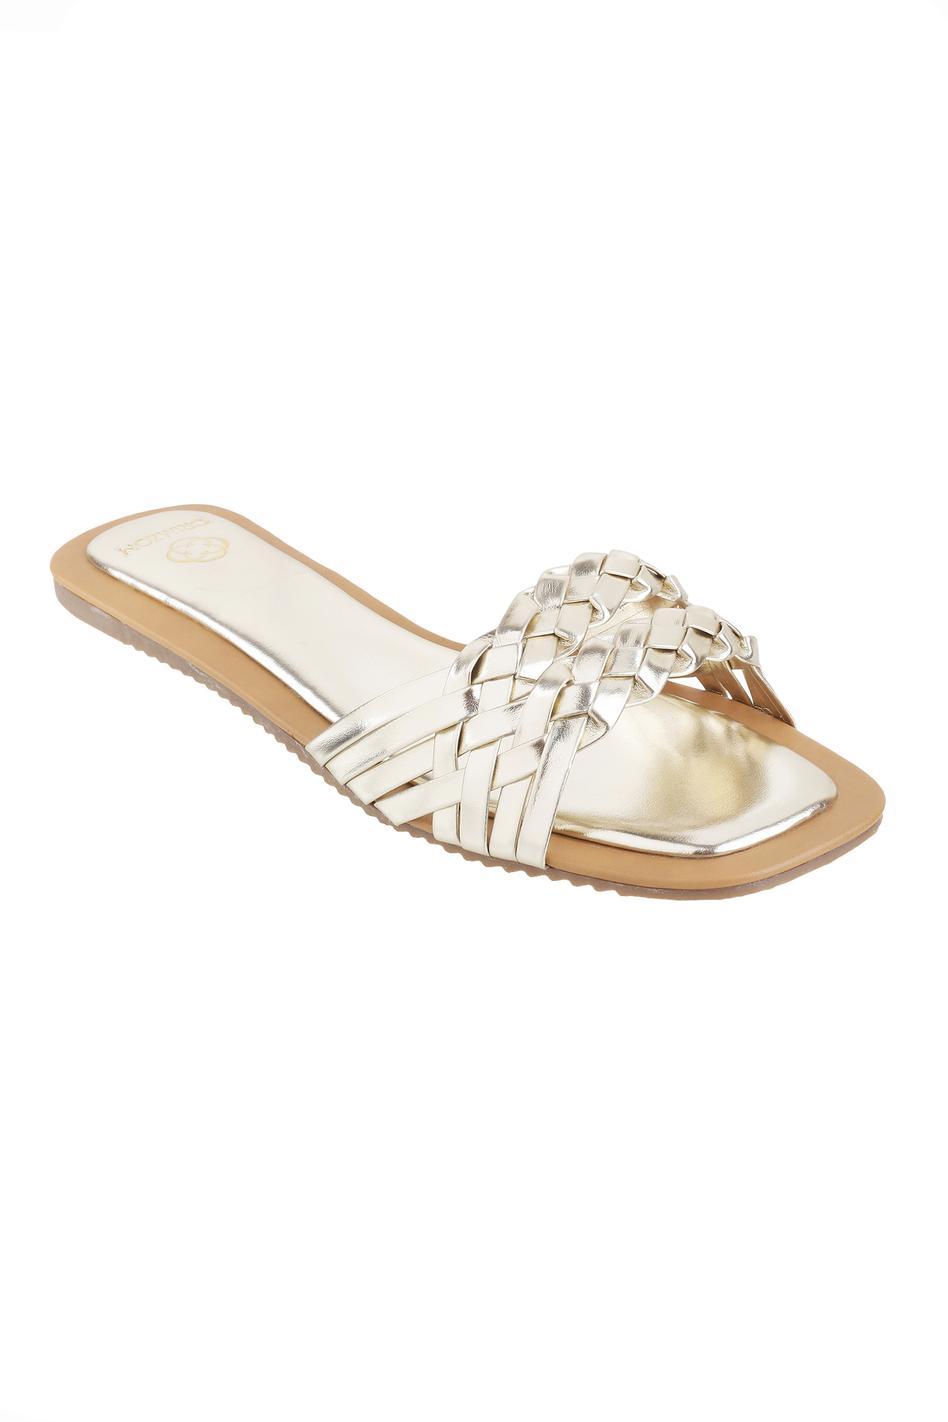 Charm Braided Strap Sandals